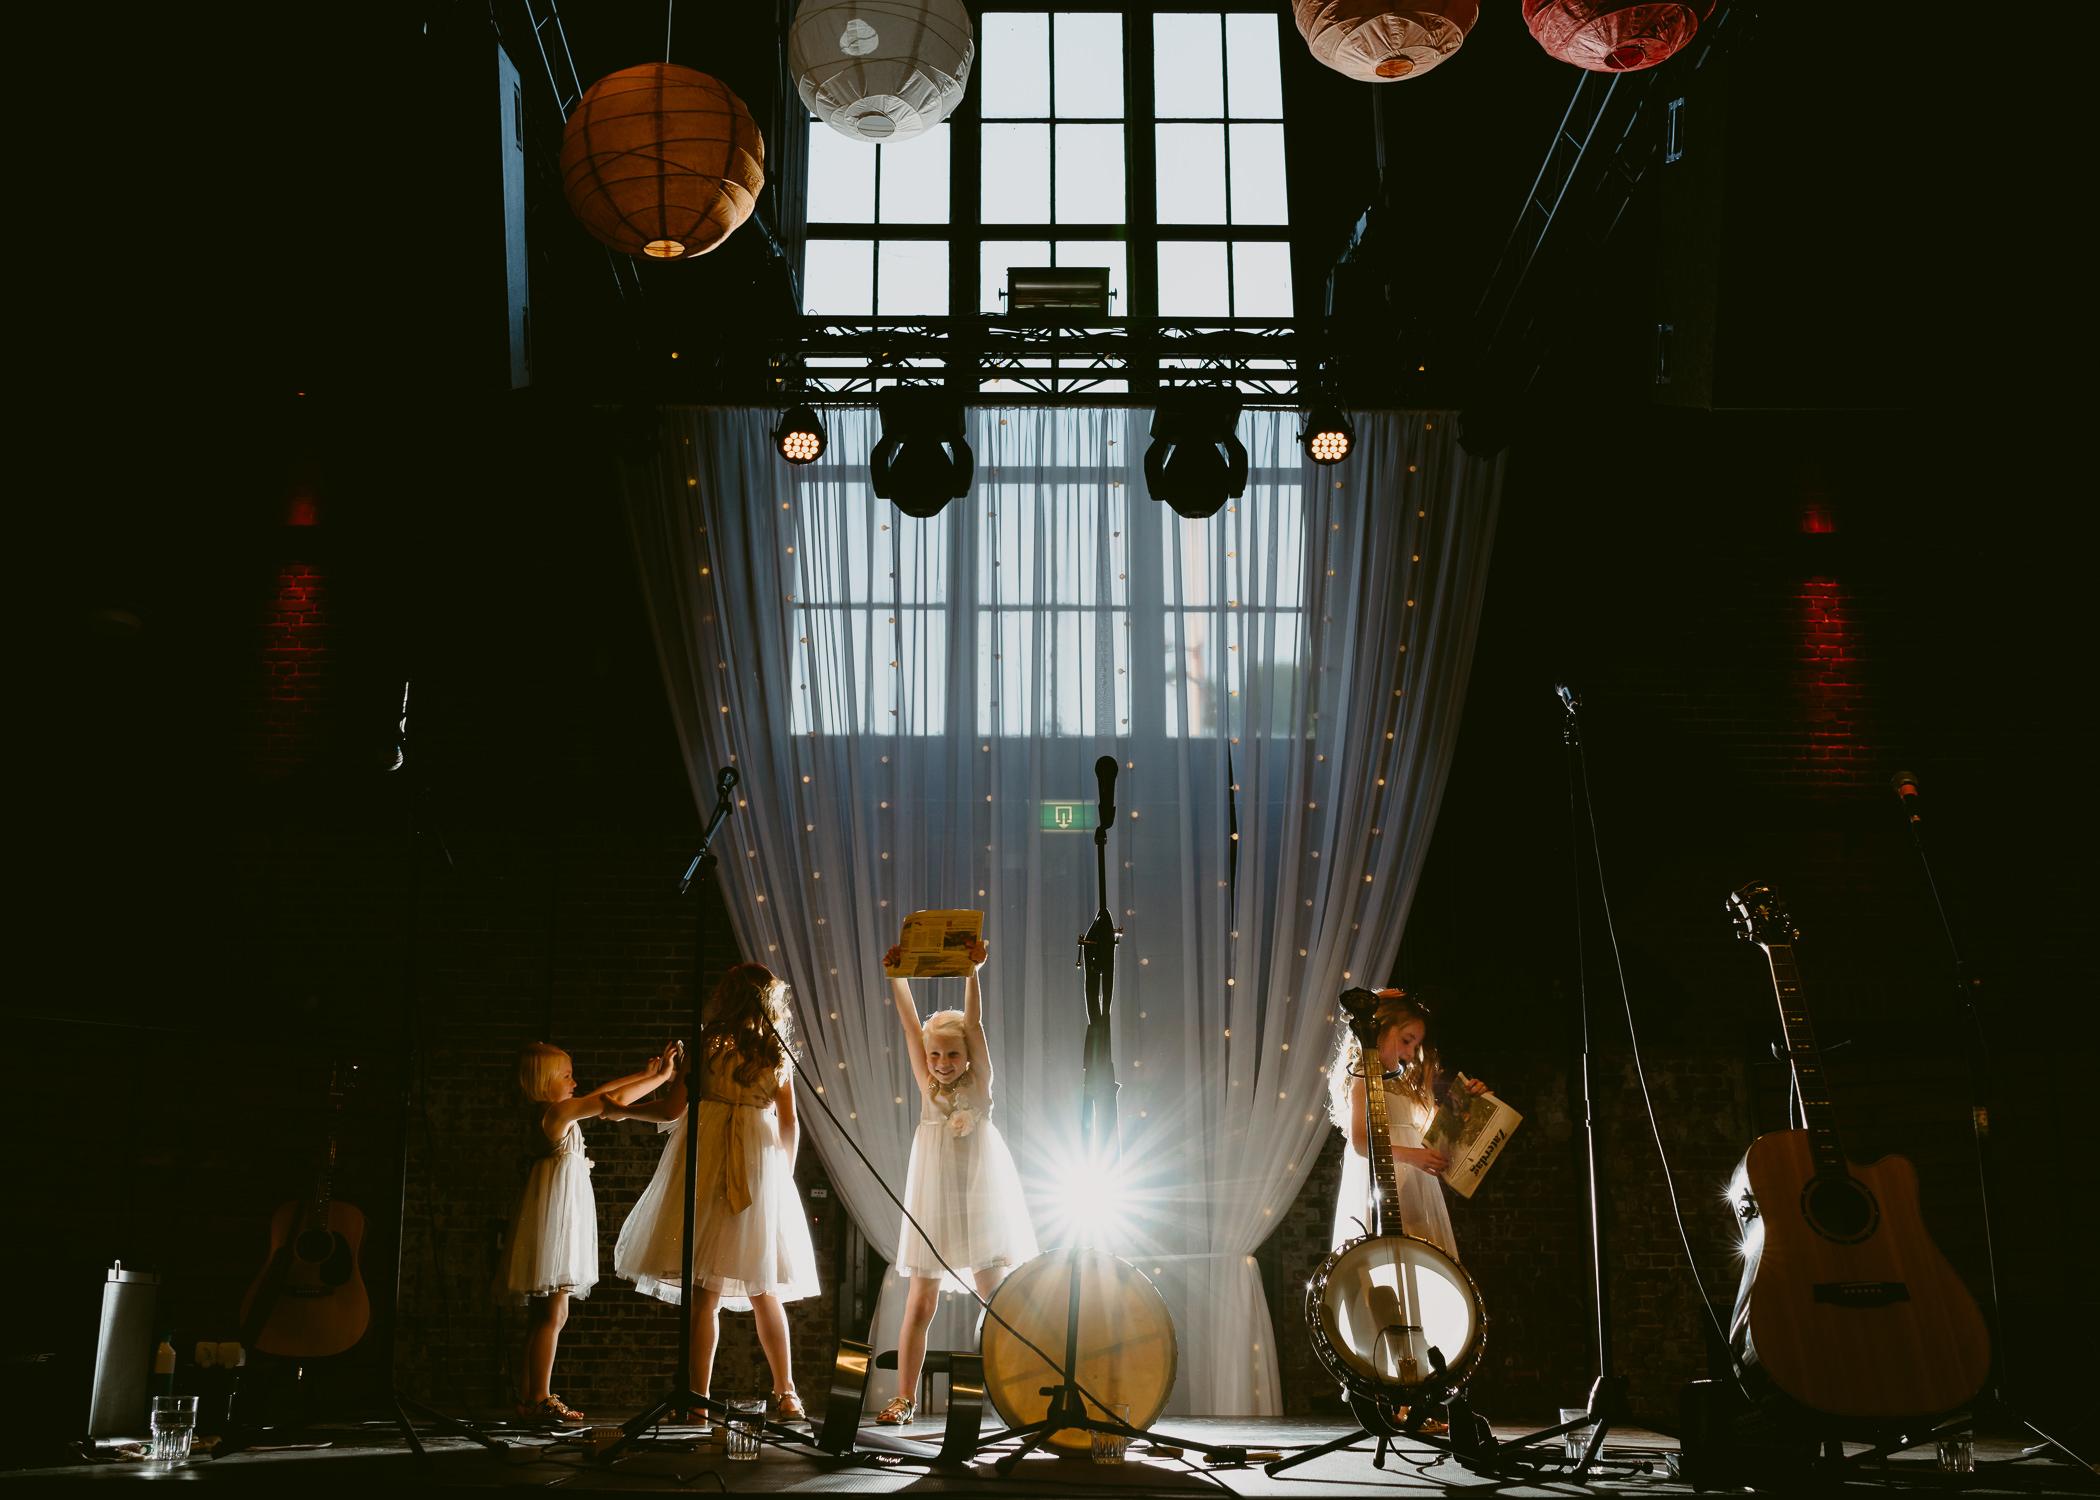 amsterdam-wedding-photographer-trouwfotograaf-bruidsfotograaf-mark-hadden-bruidsfotografie-David & Ronald-337.jpg